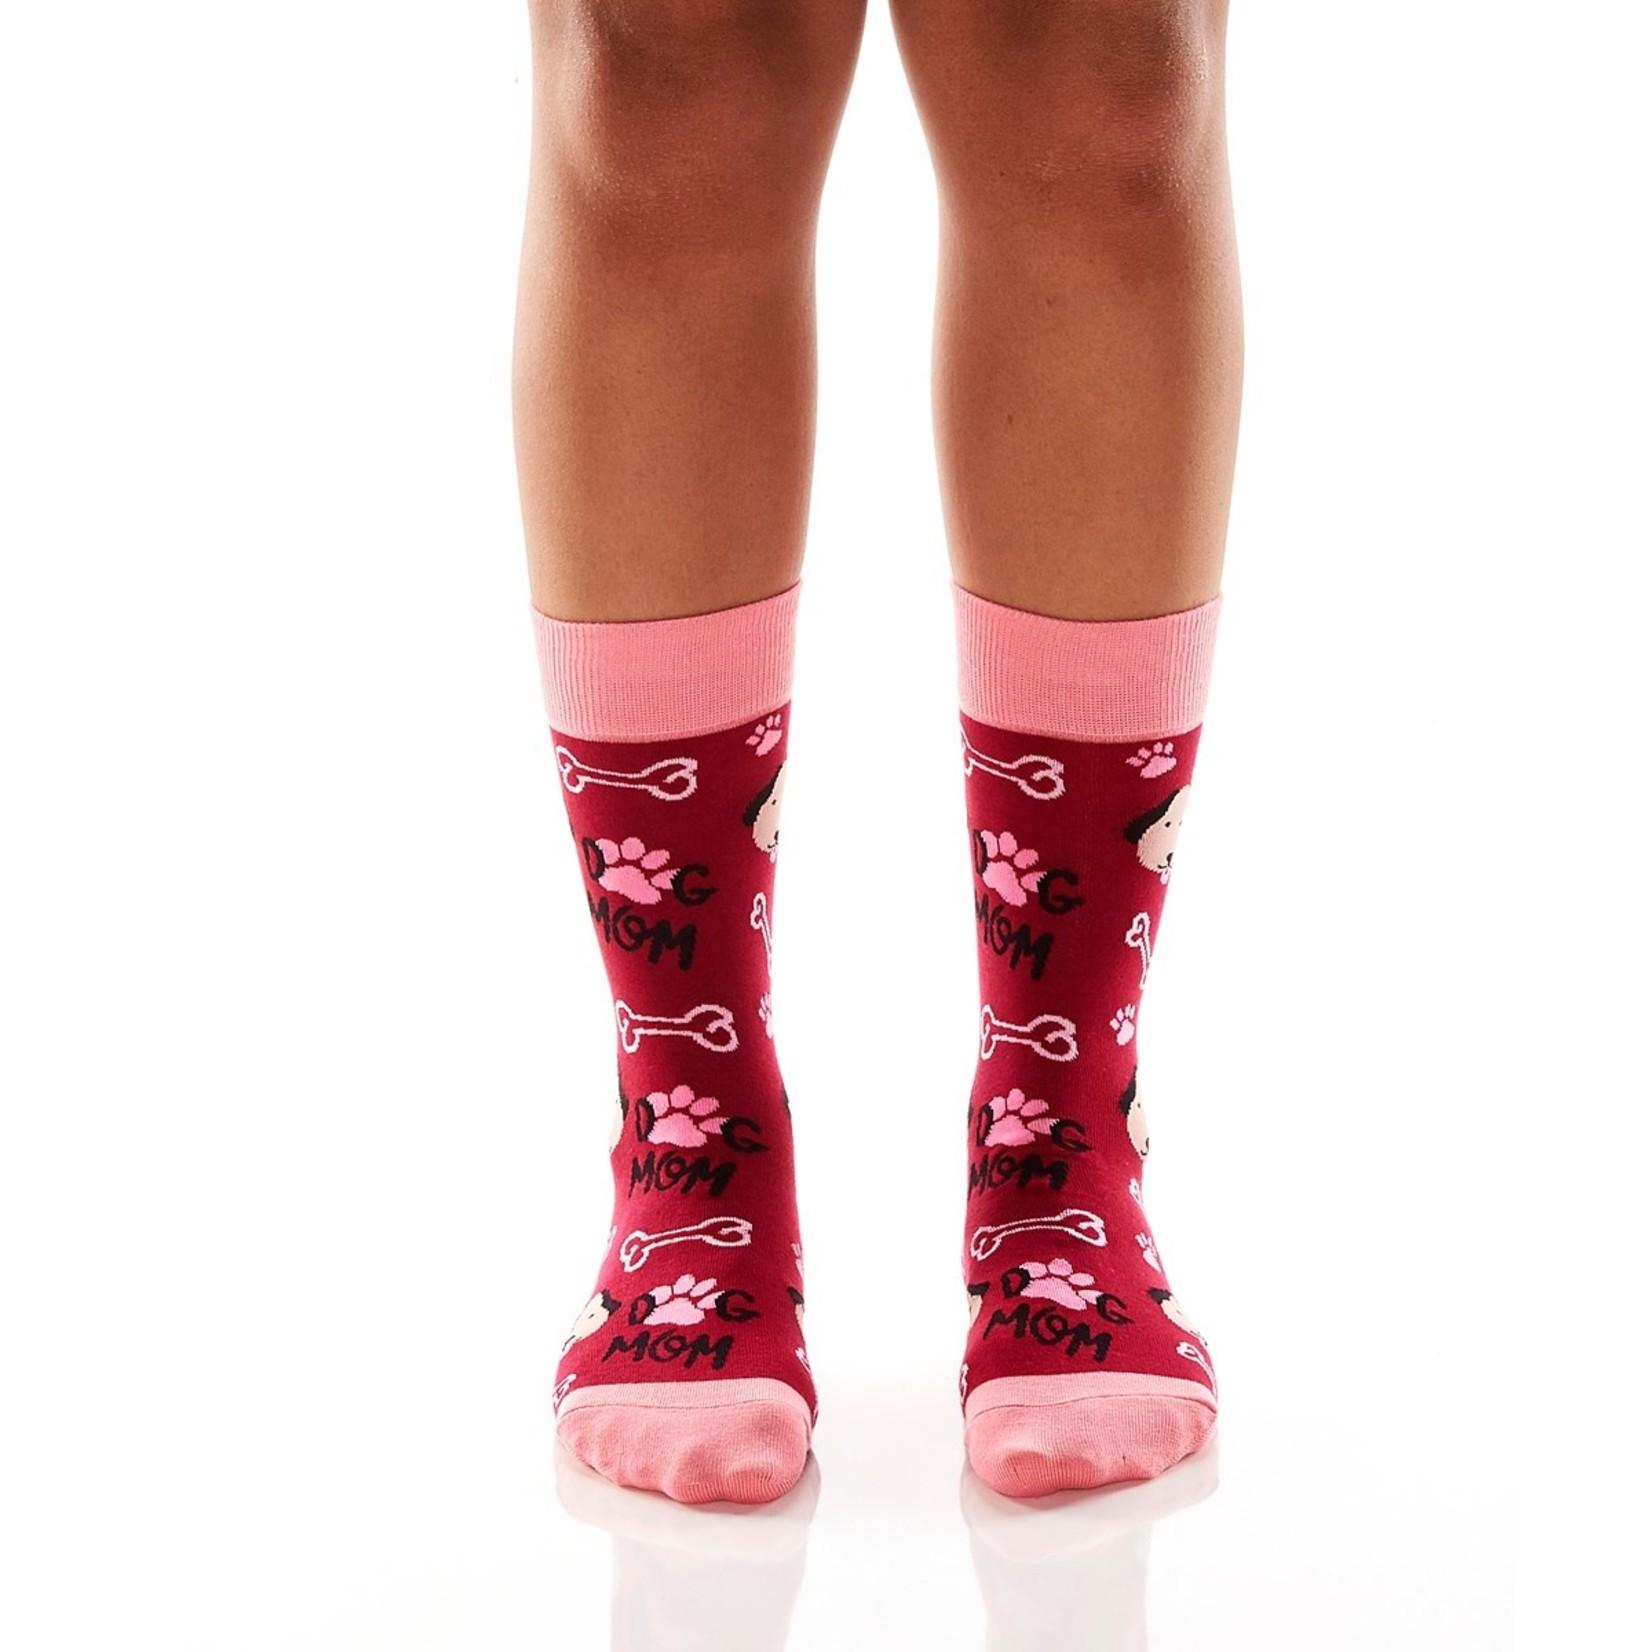 Dog Mom Women's Crew Socks